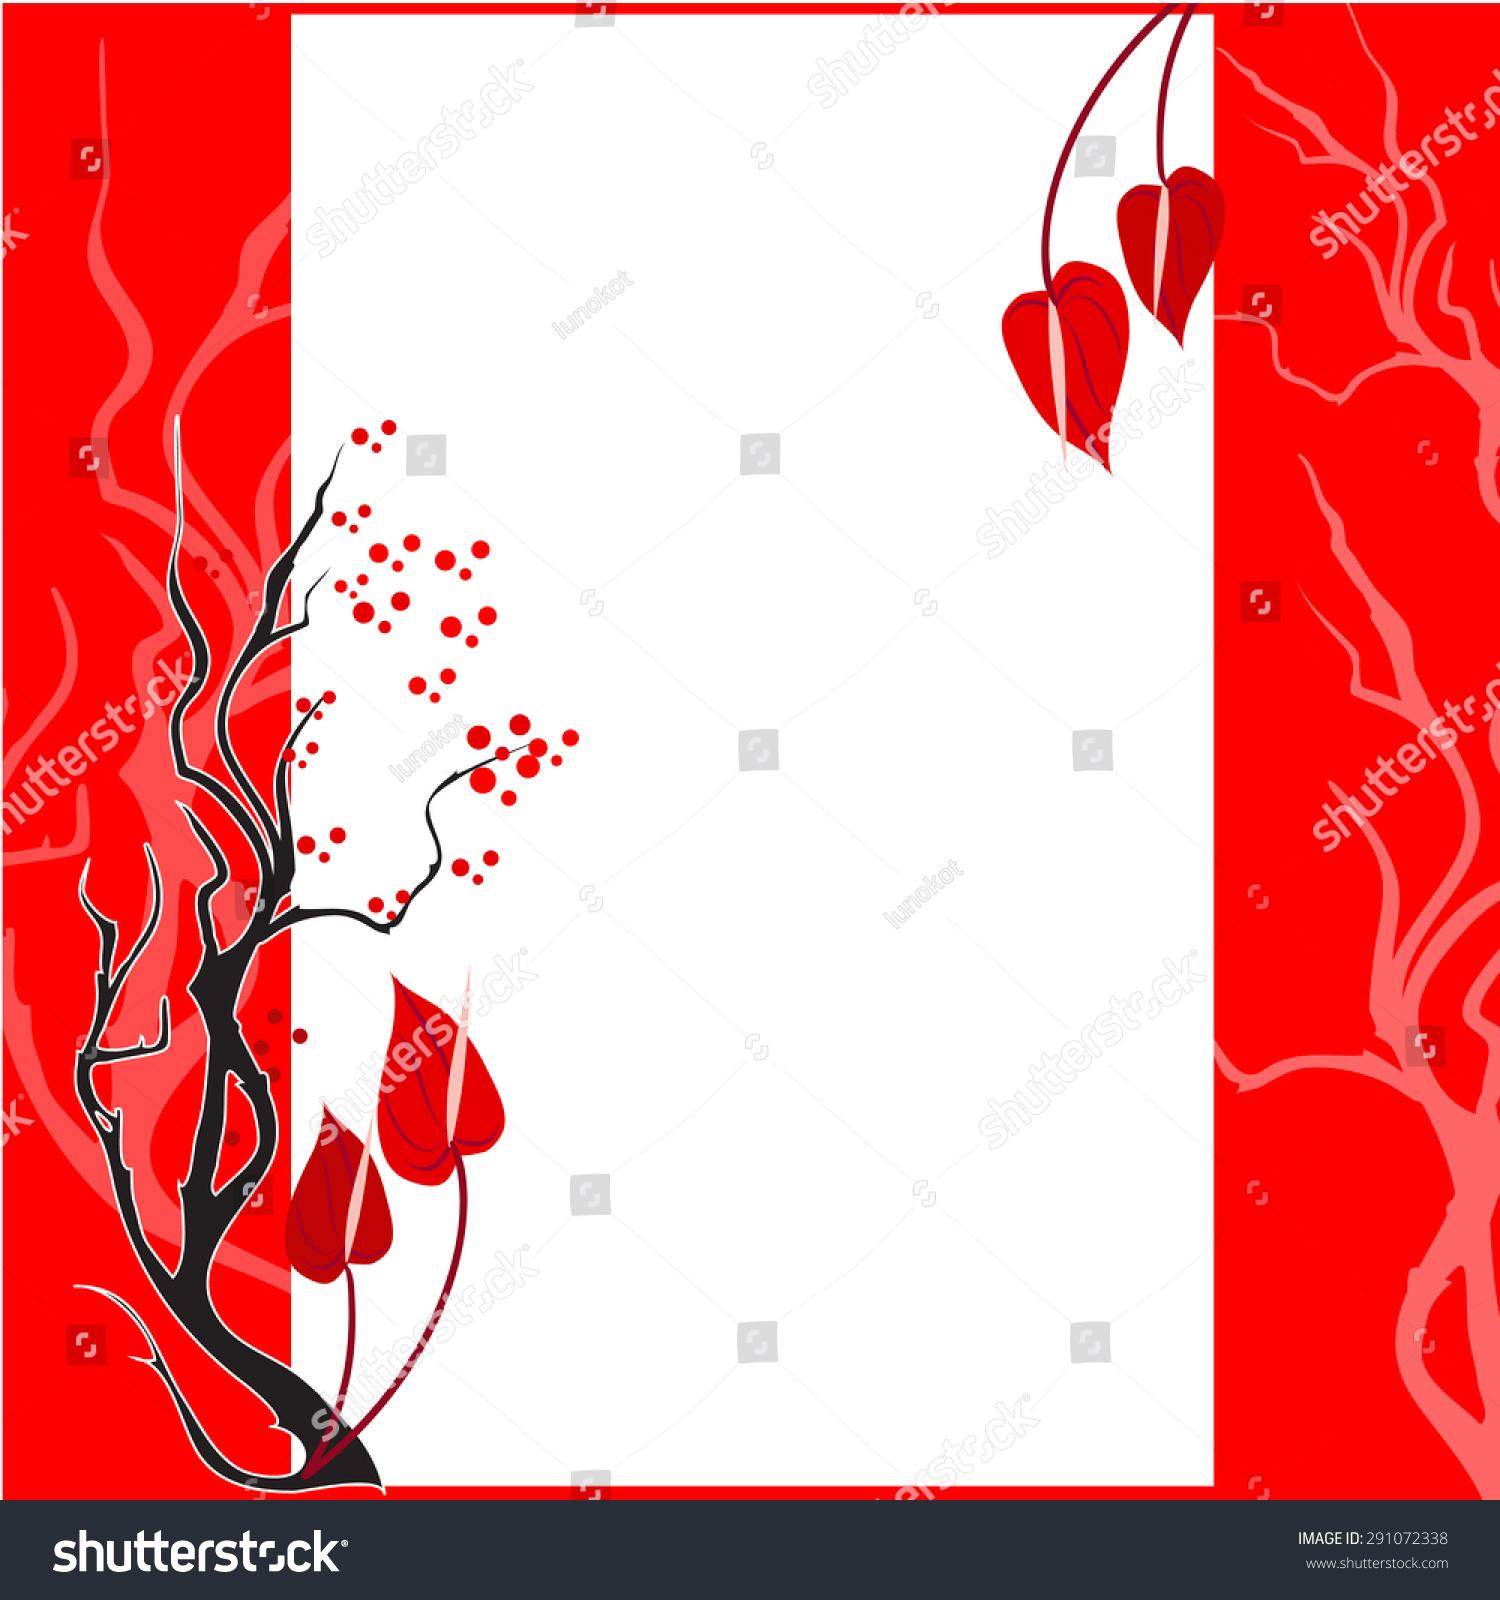 Ikebana Red Flower Background Wedding Invitation Stock Vector ...